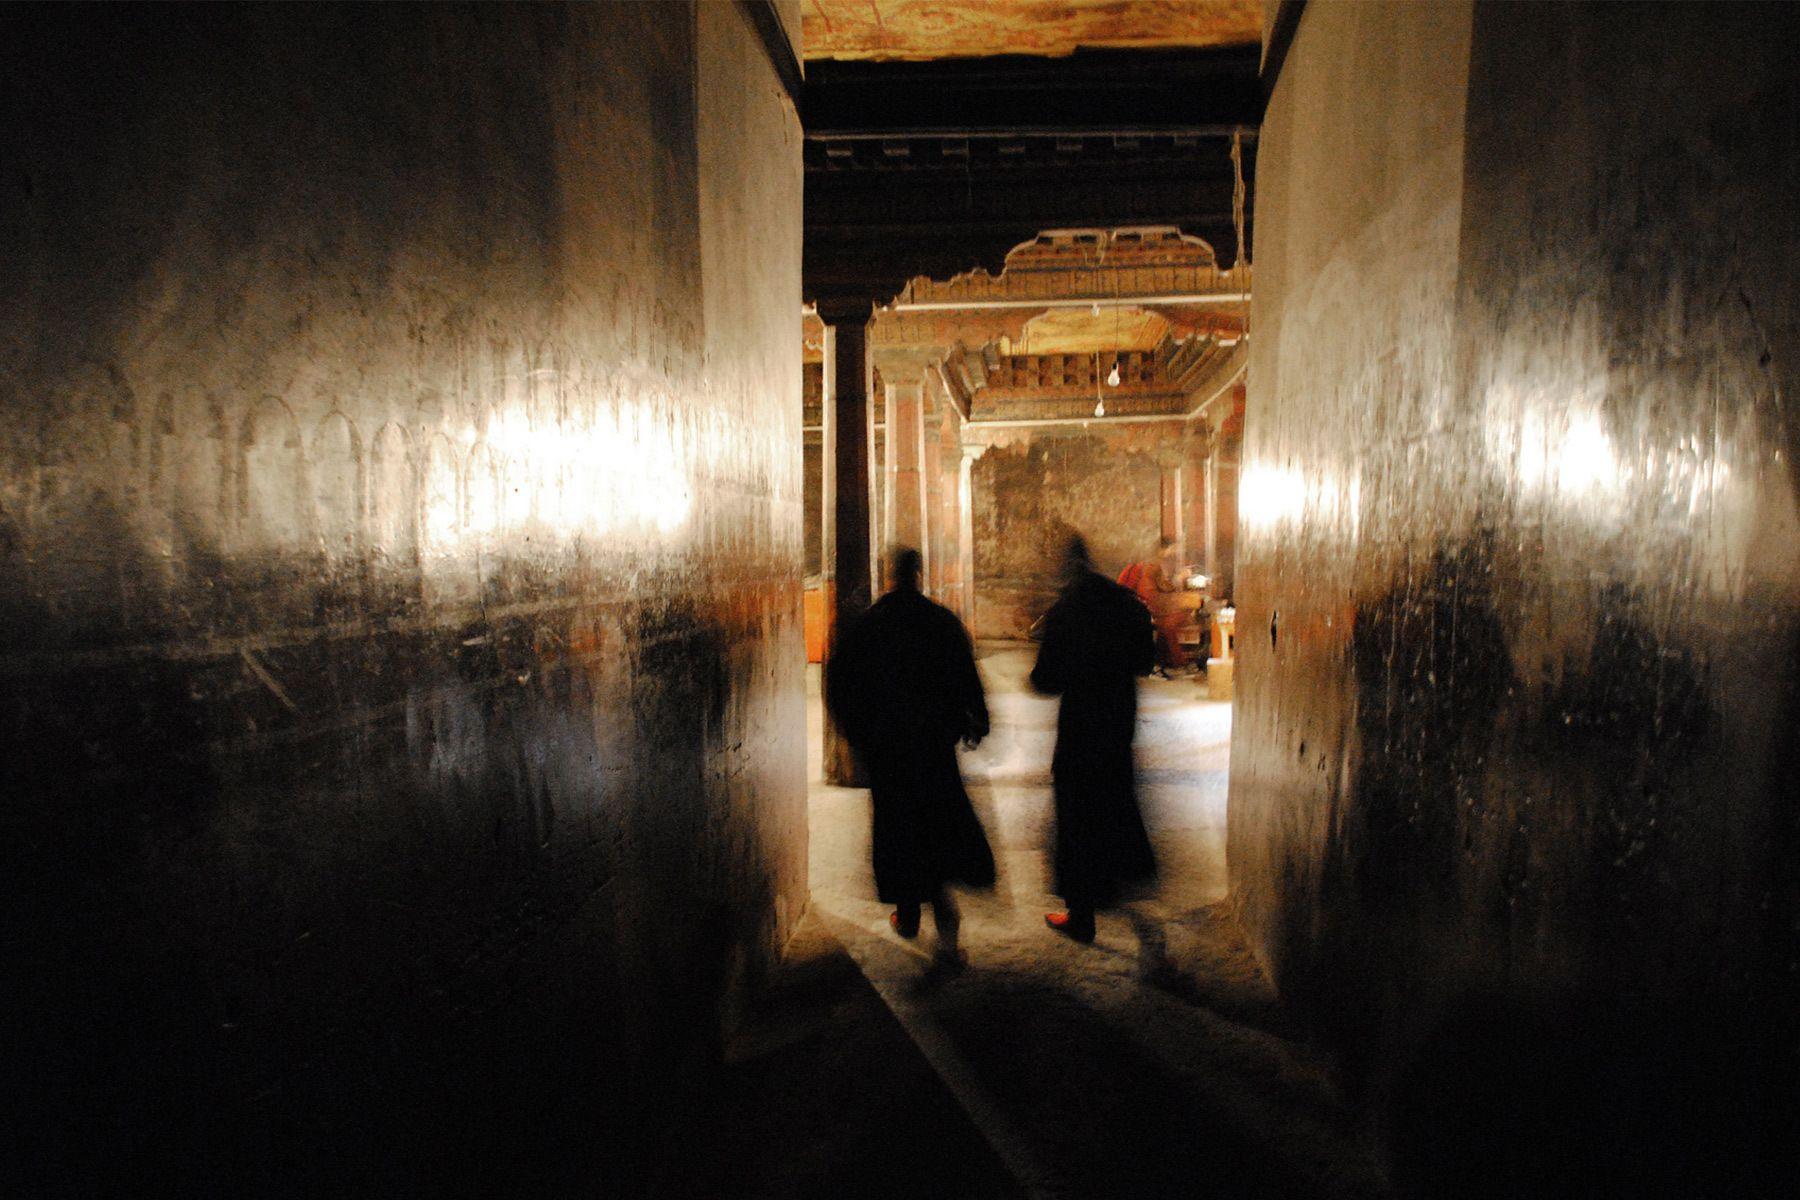 1r10___tibet_temple_templo_monk_buddhist_buddhism_budista_monje.jpg